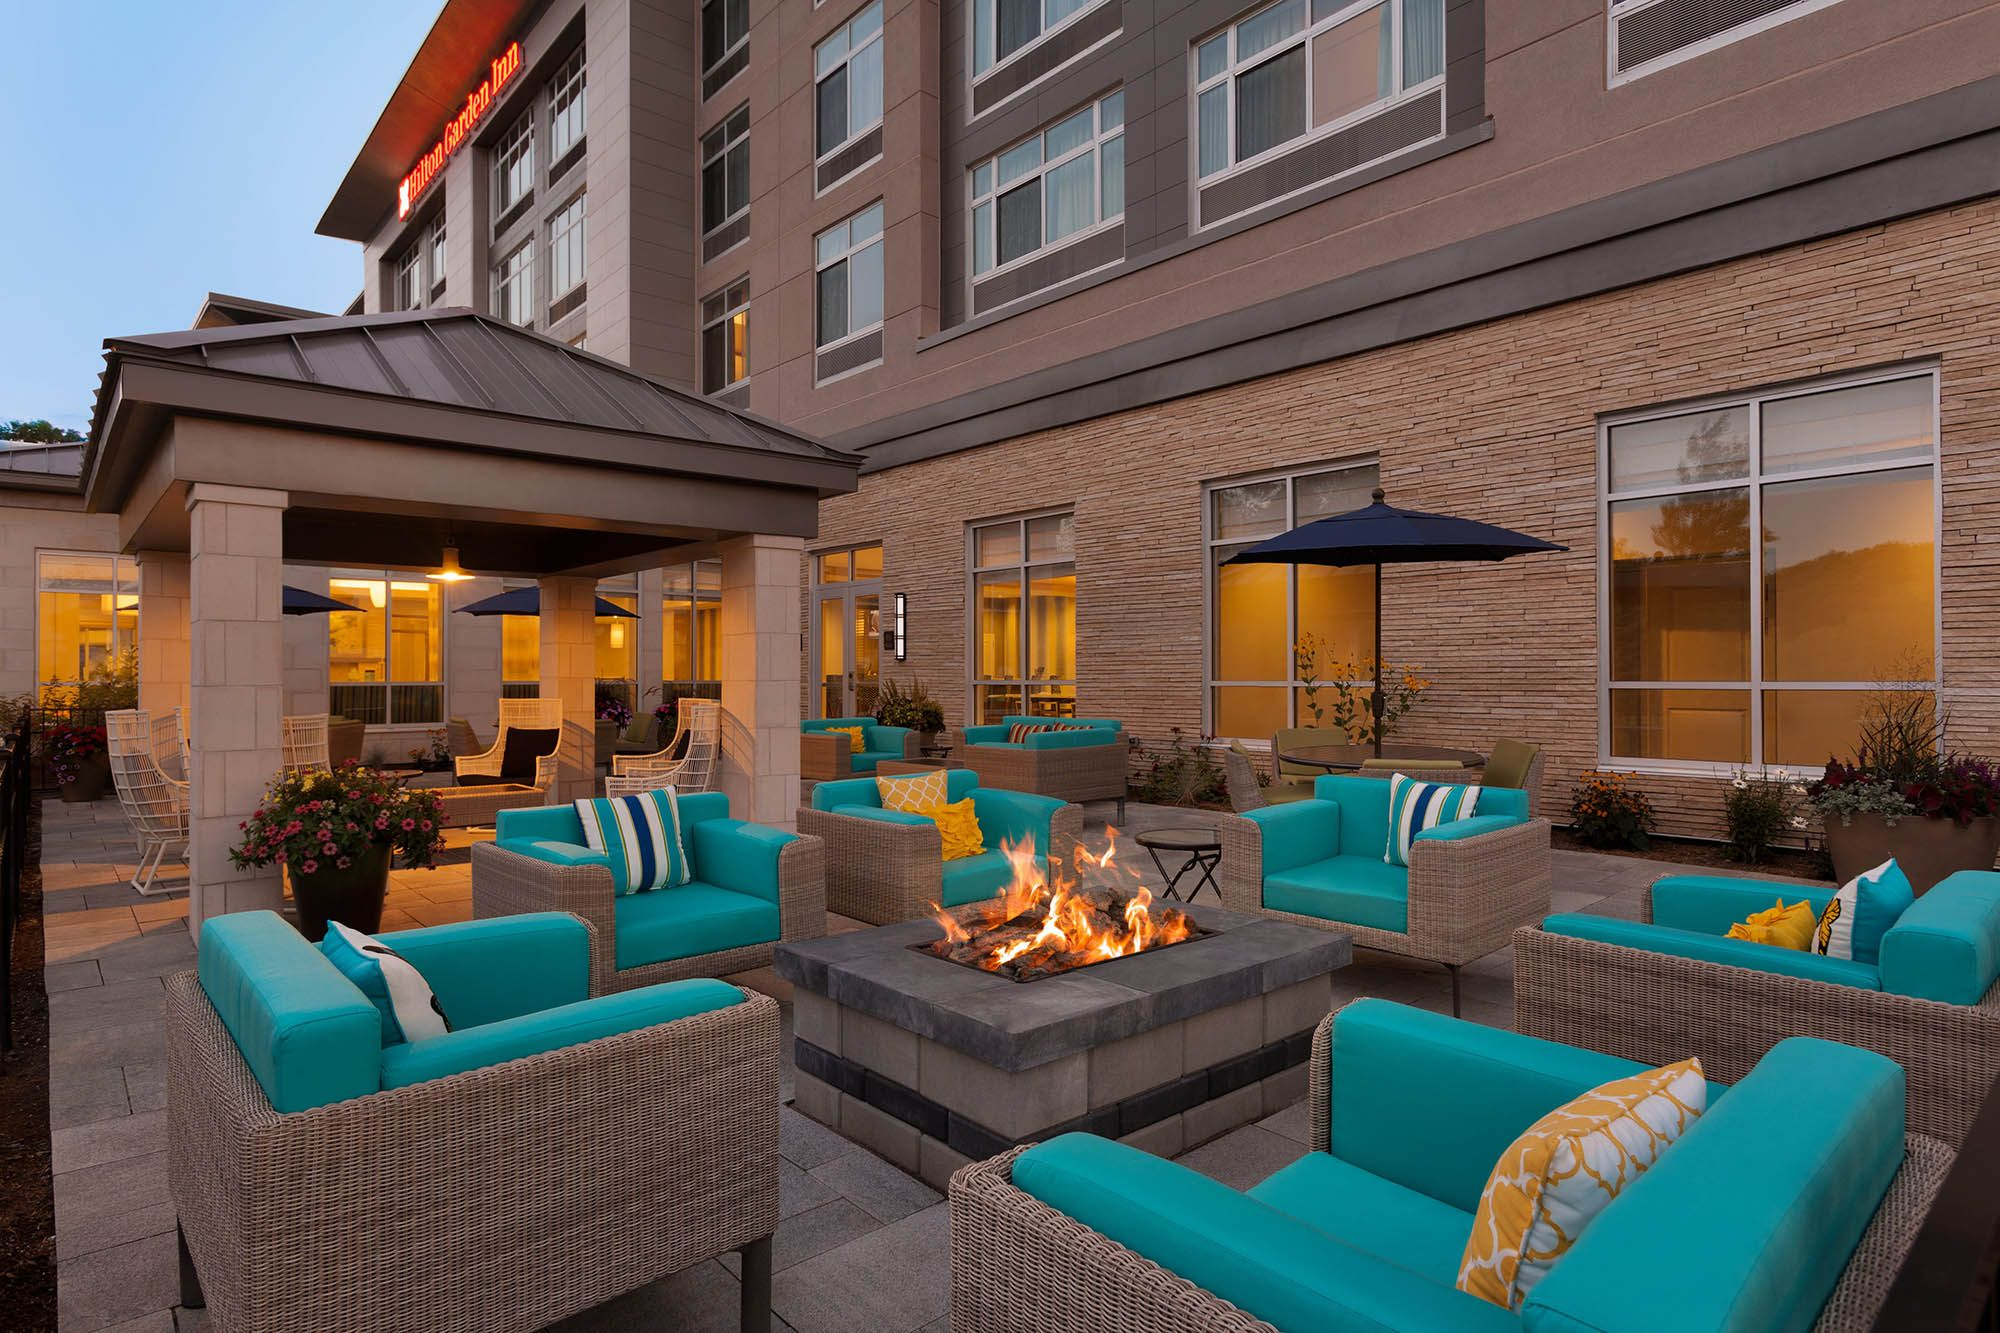 Hilton Garden Inn Lenox/Pittsfield Hilton garden inn